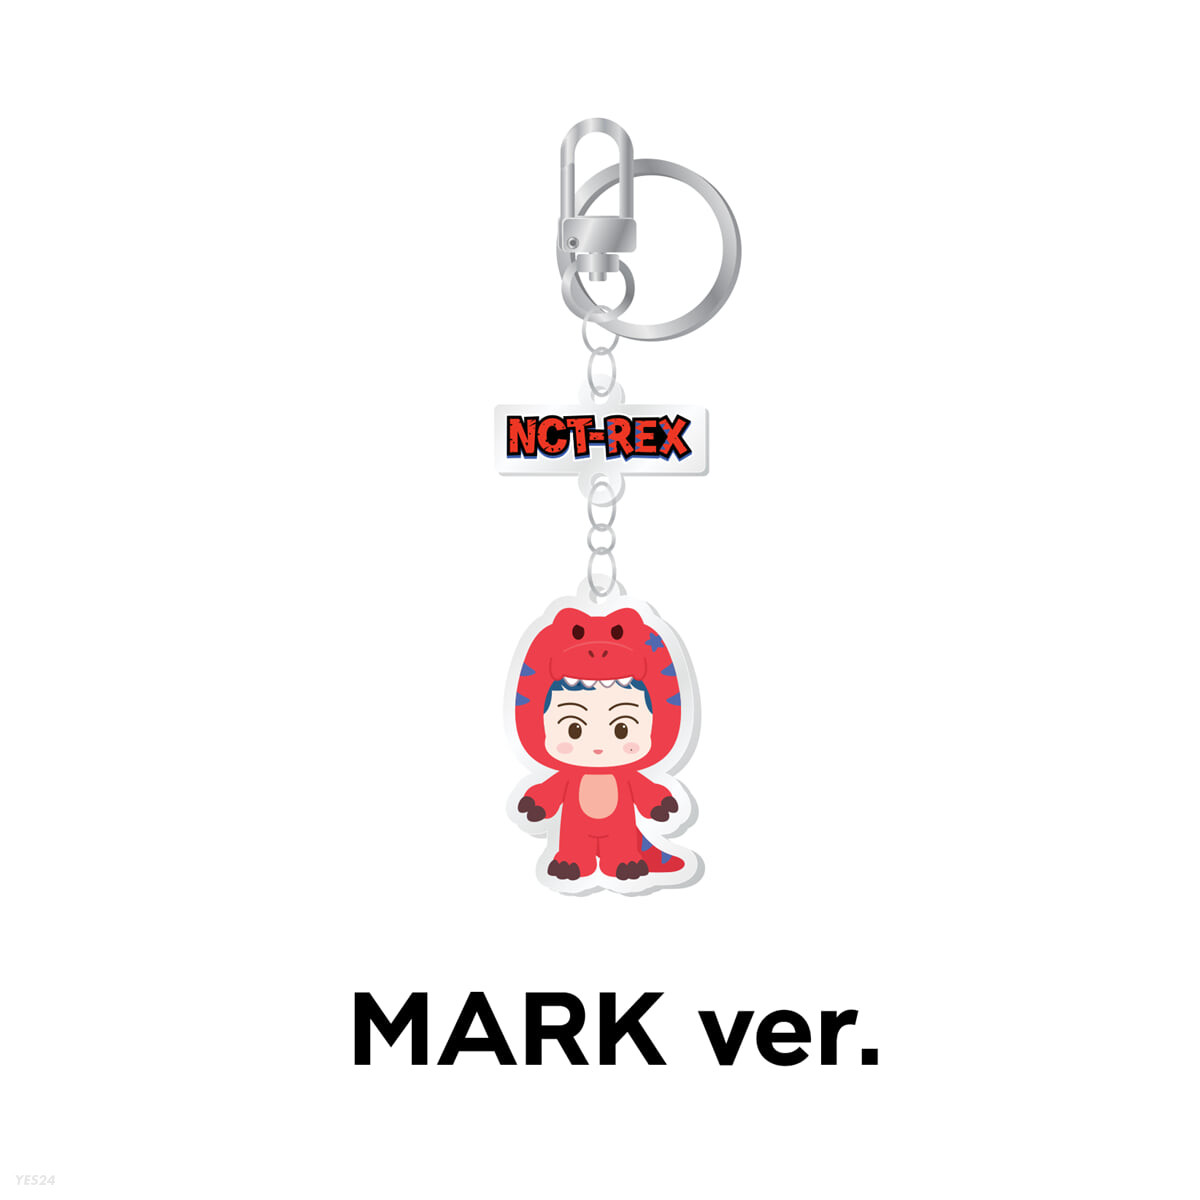 [MARK] ACRYLIC KEY RING - NCT DREAM X PINKFONG